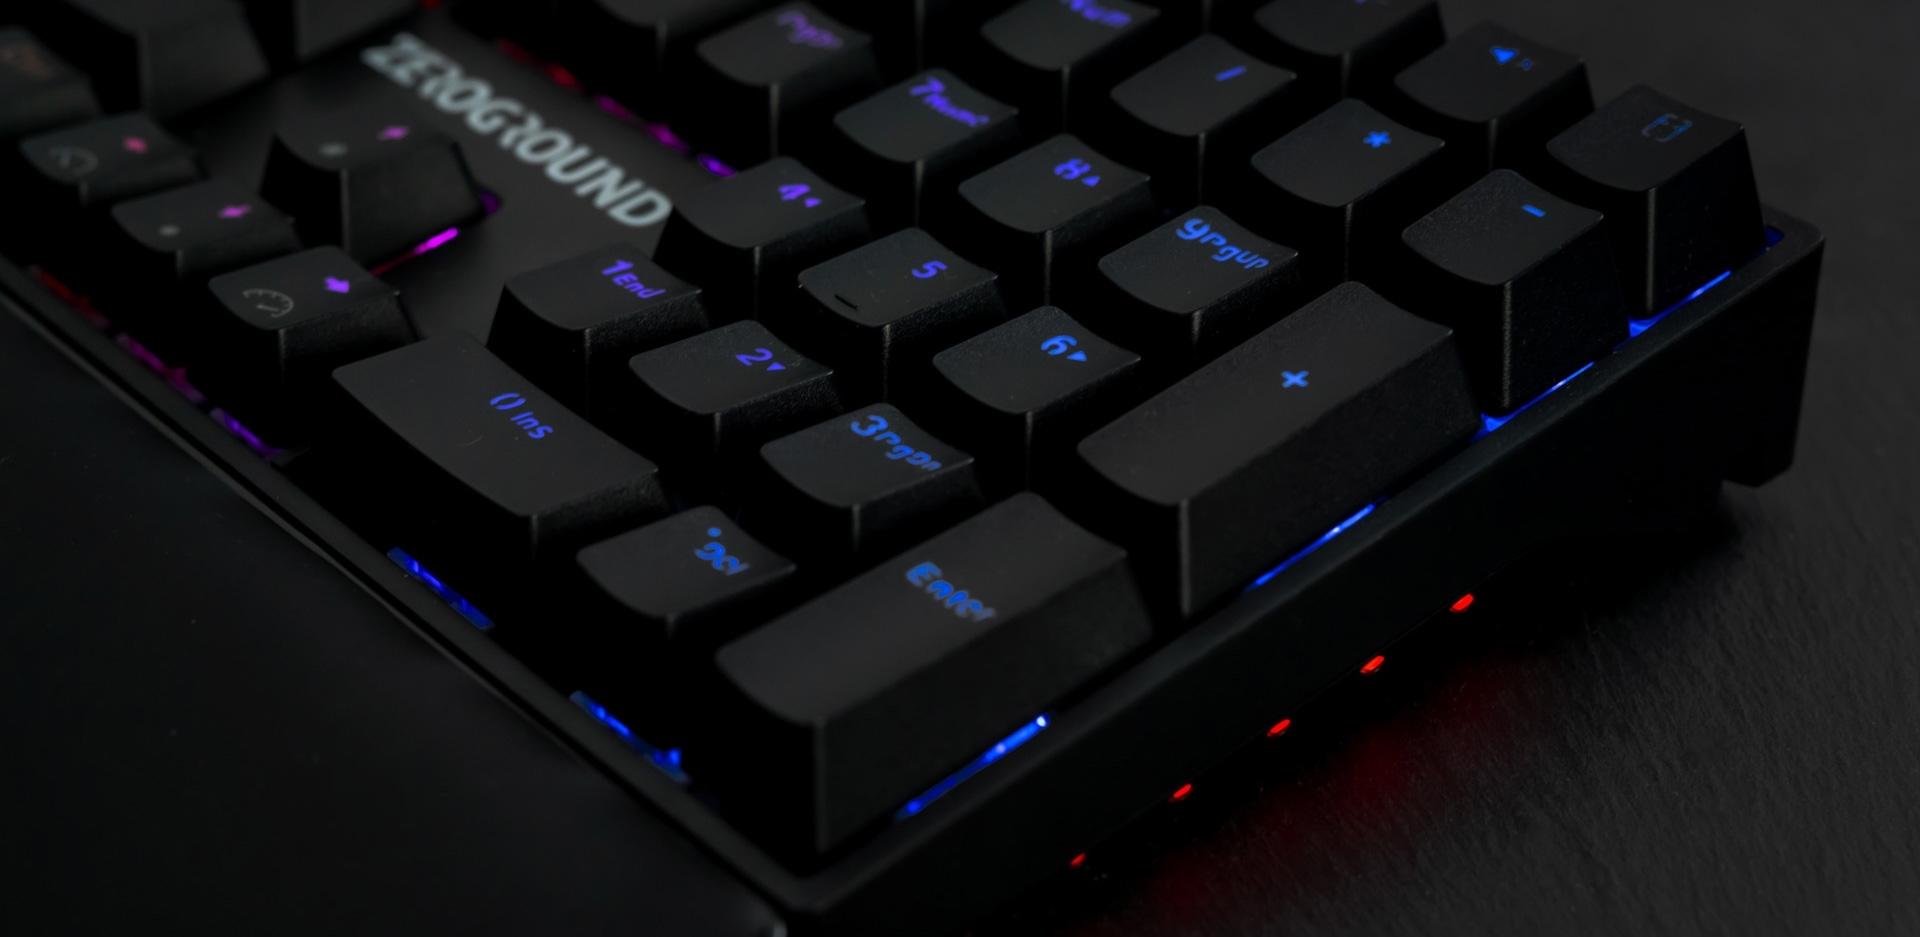 ZeroGround Tonado Mini - Gaming keyboard